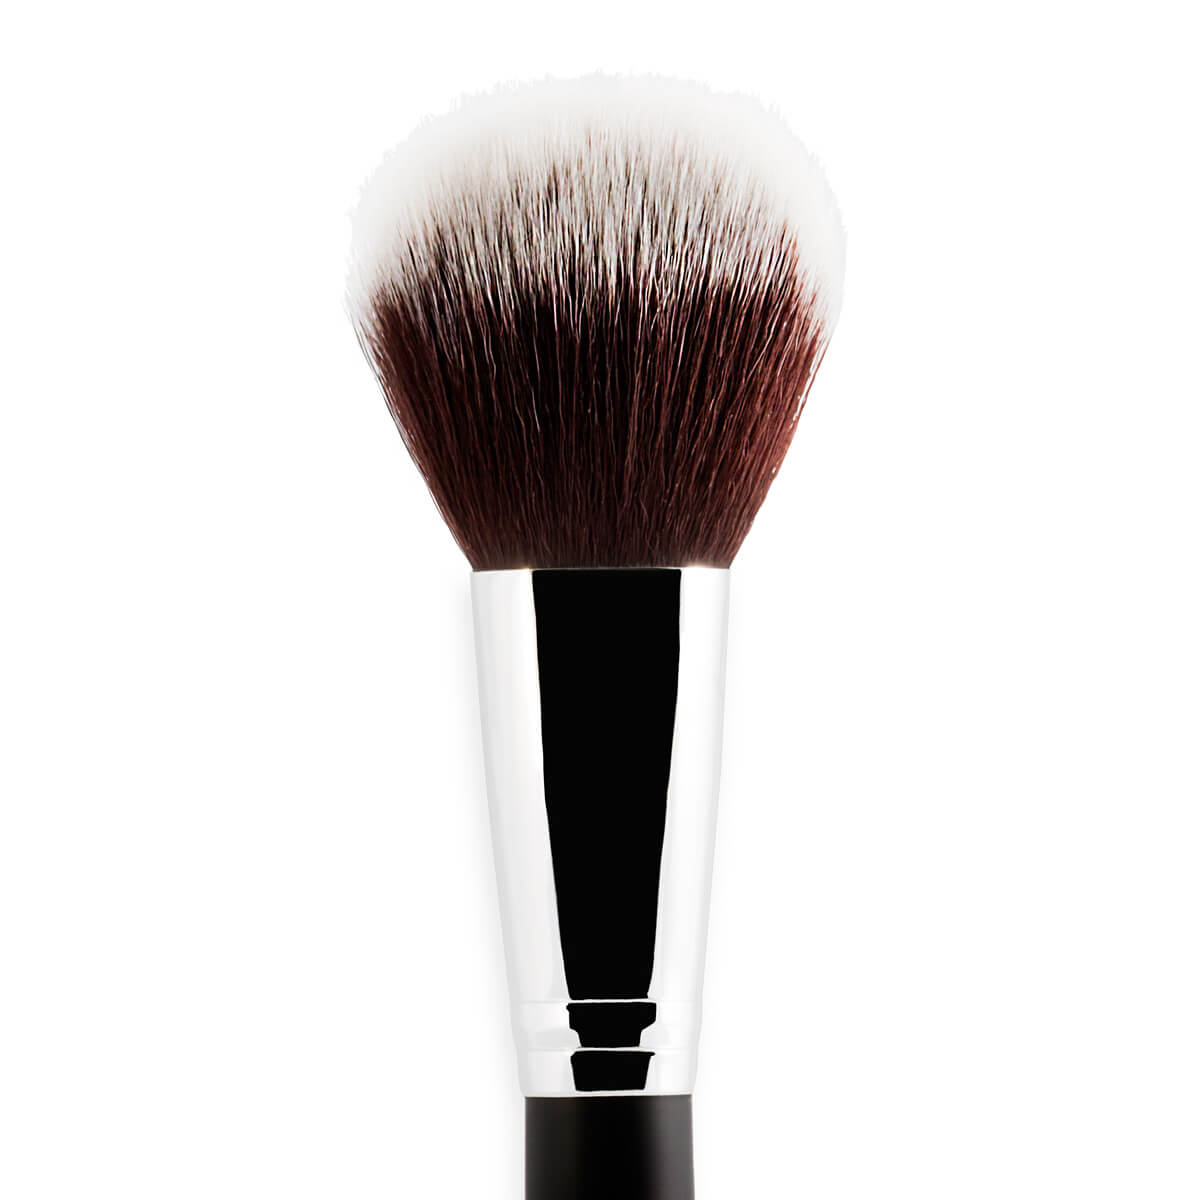 S111 - Pincel Para Pó Profissional Sffumato Beauty